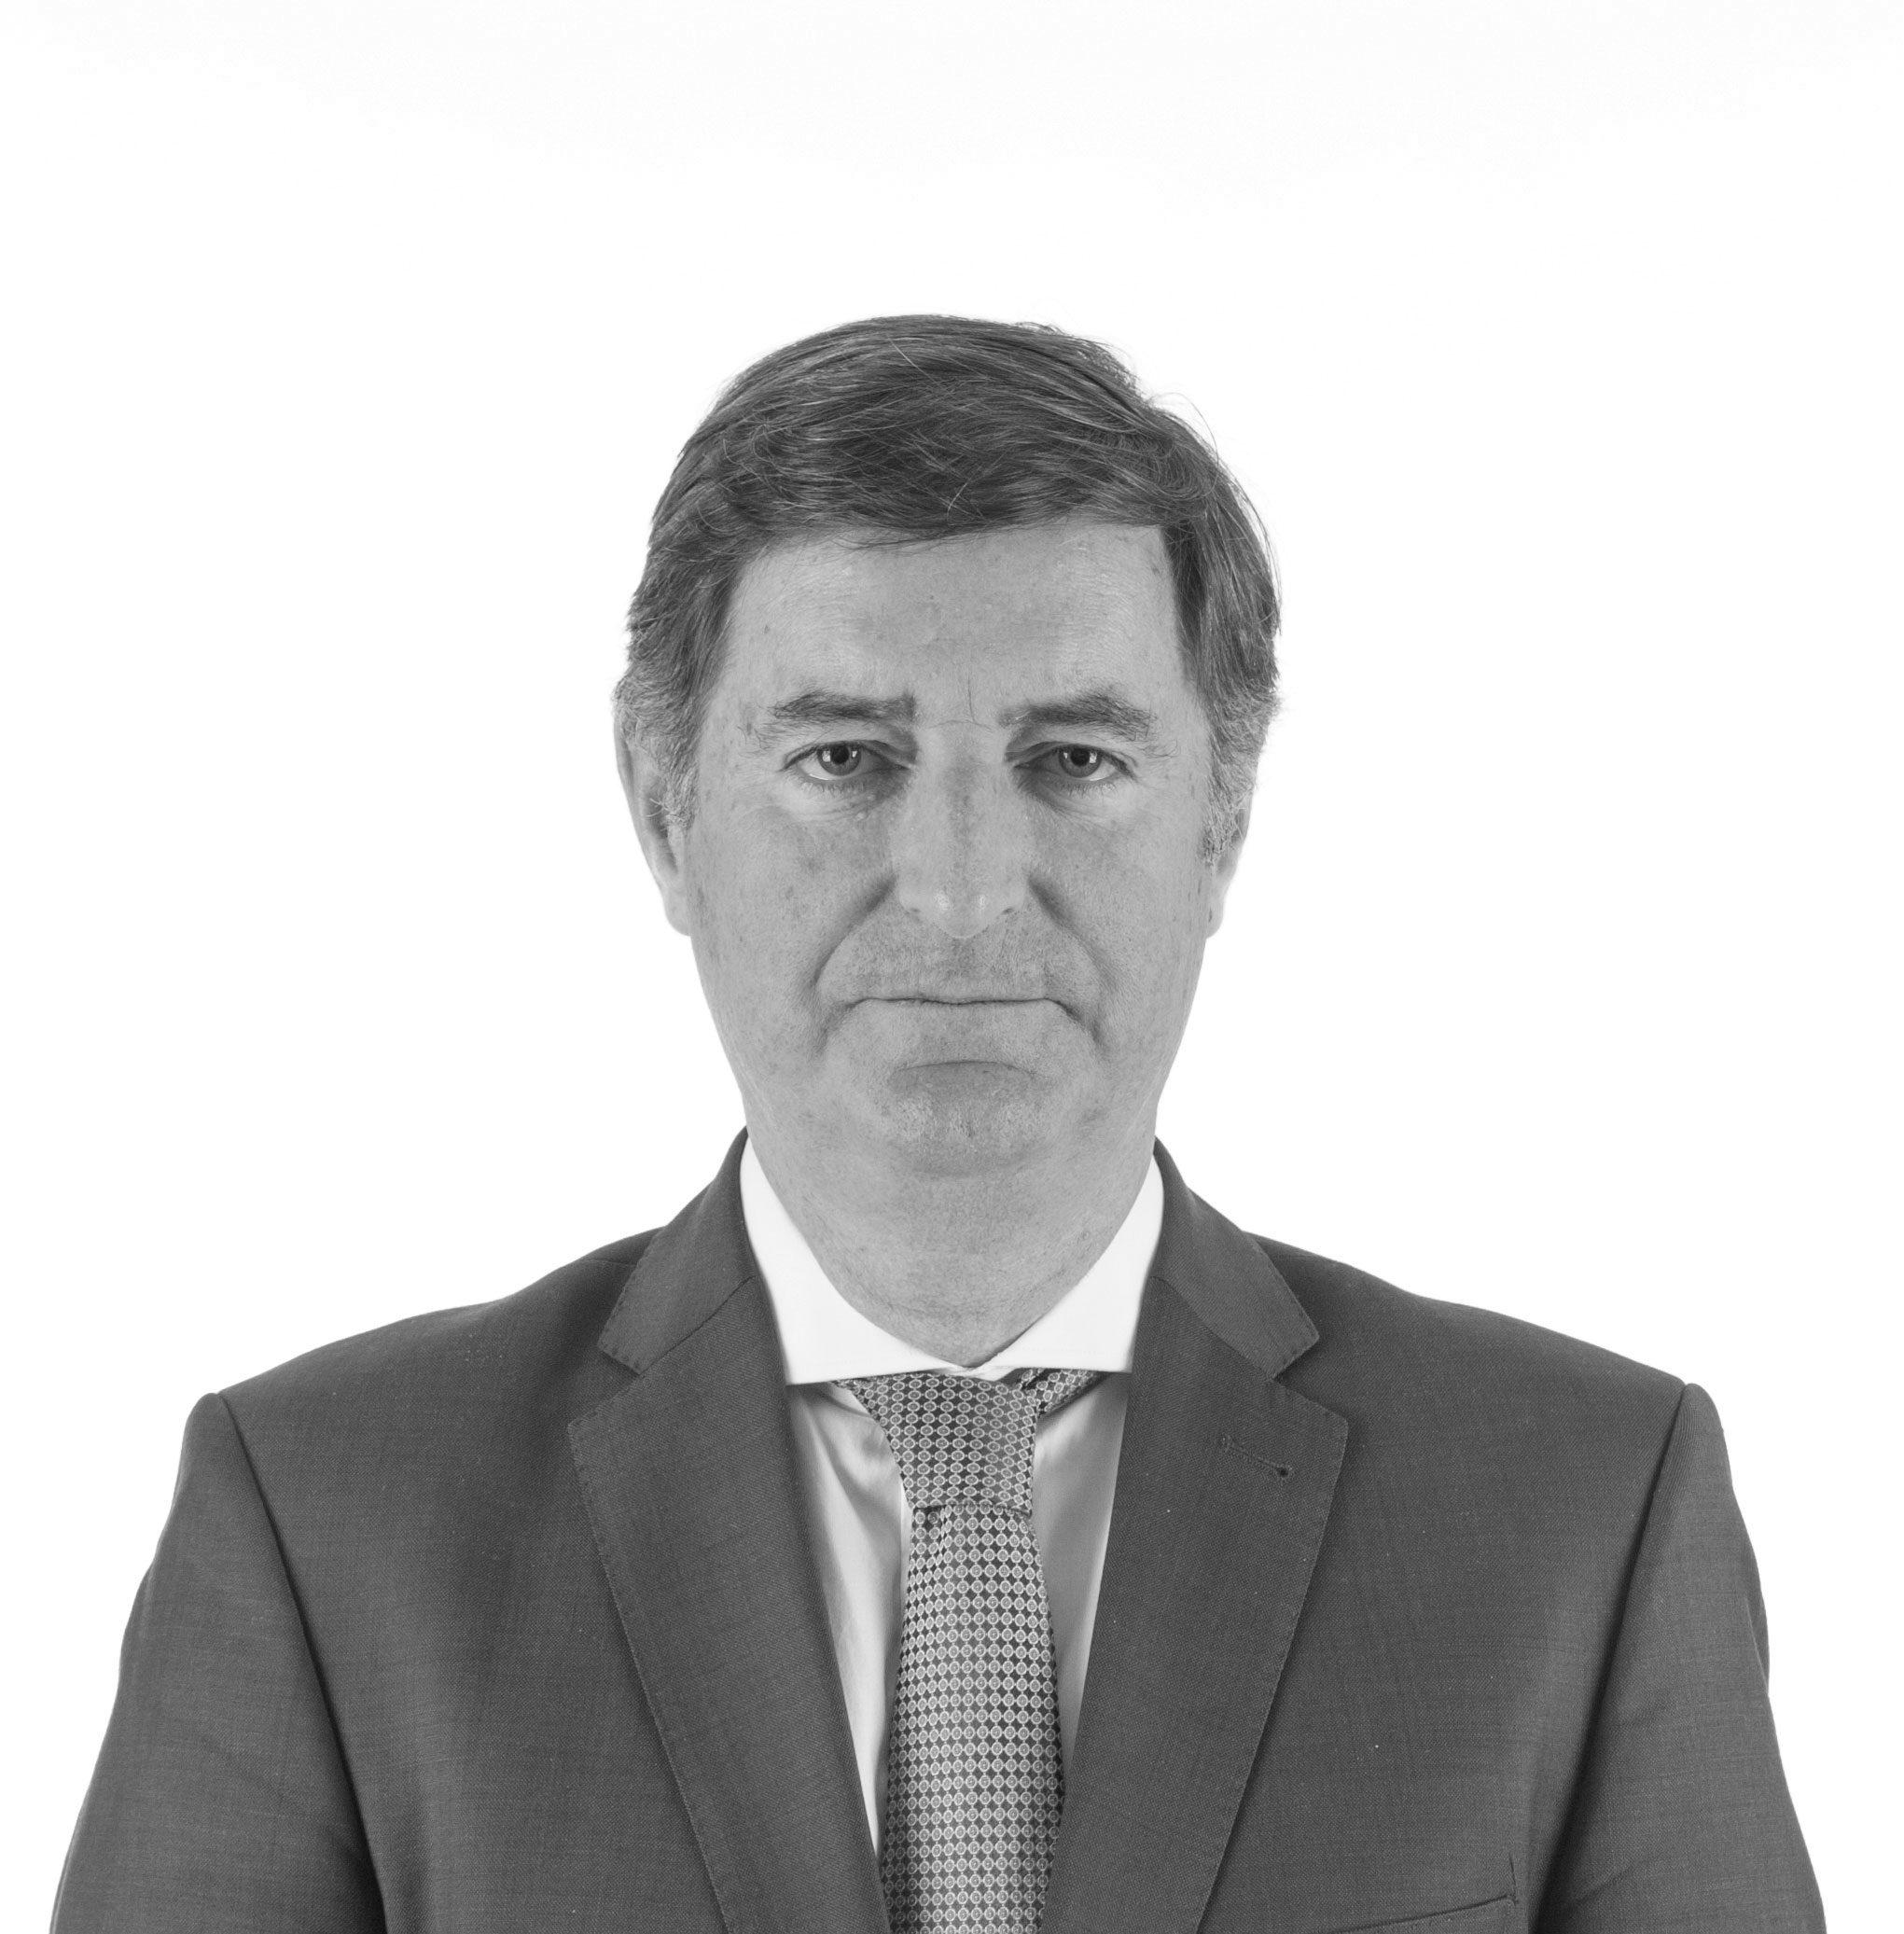 Ignacio Peironcely